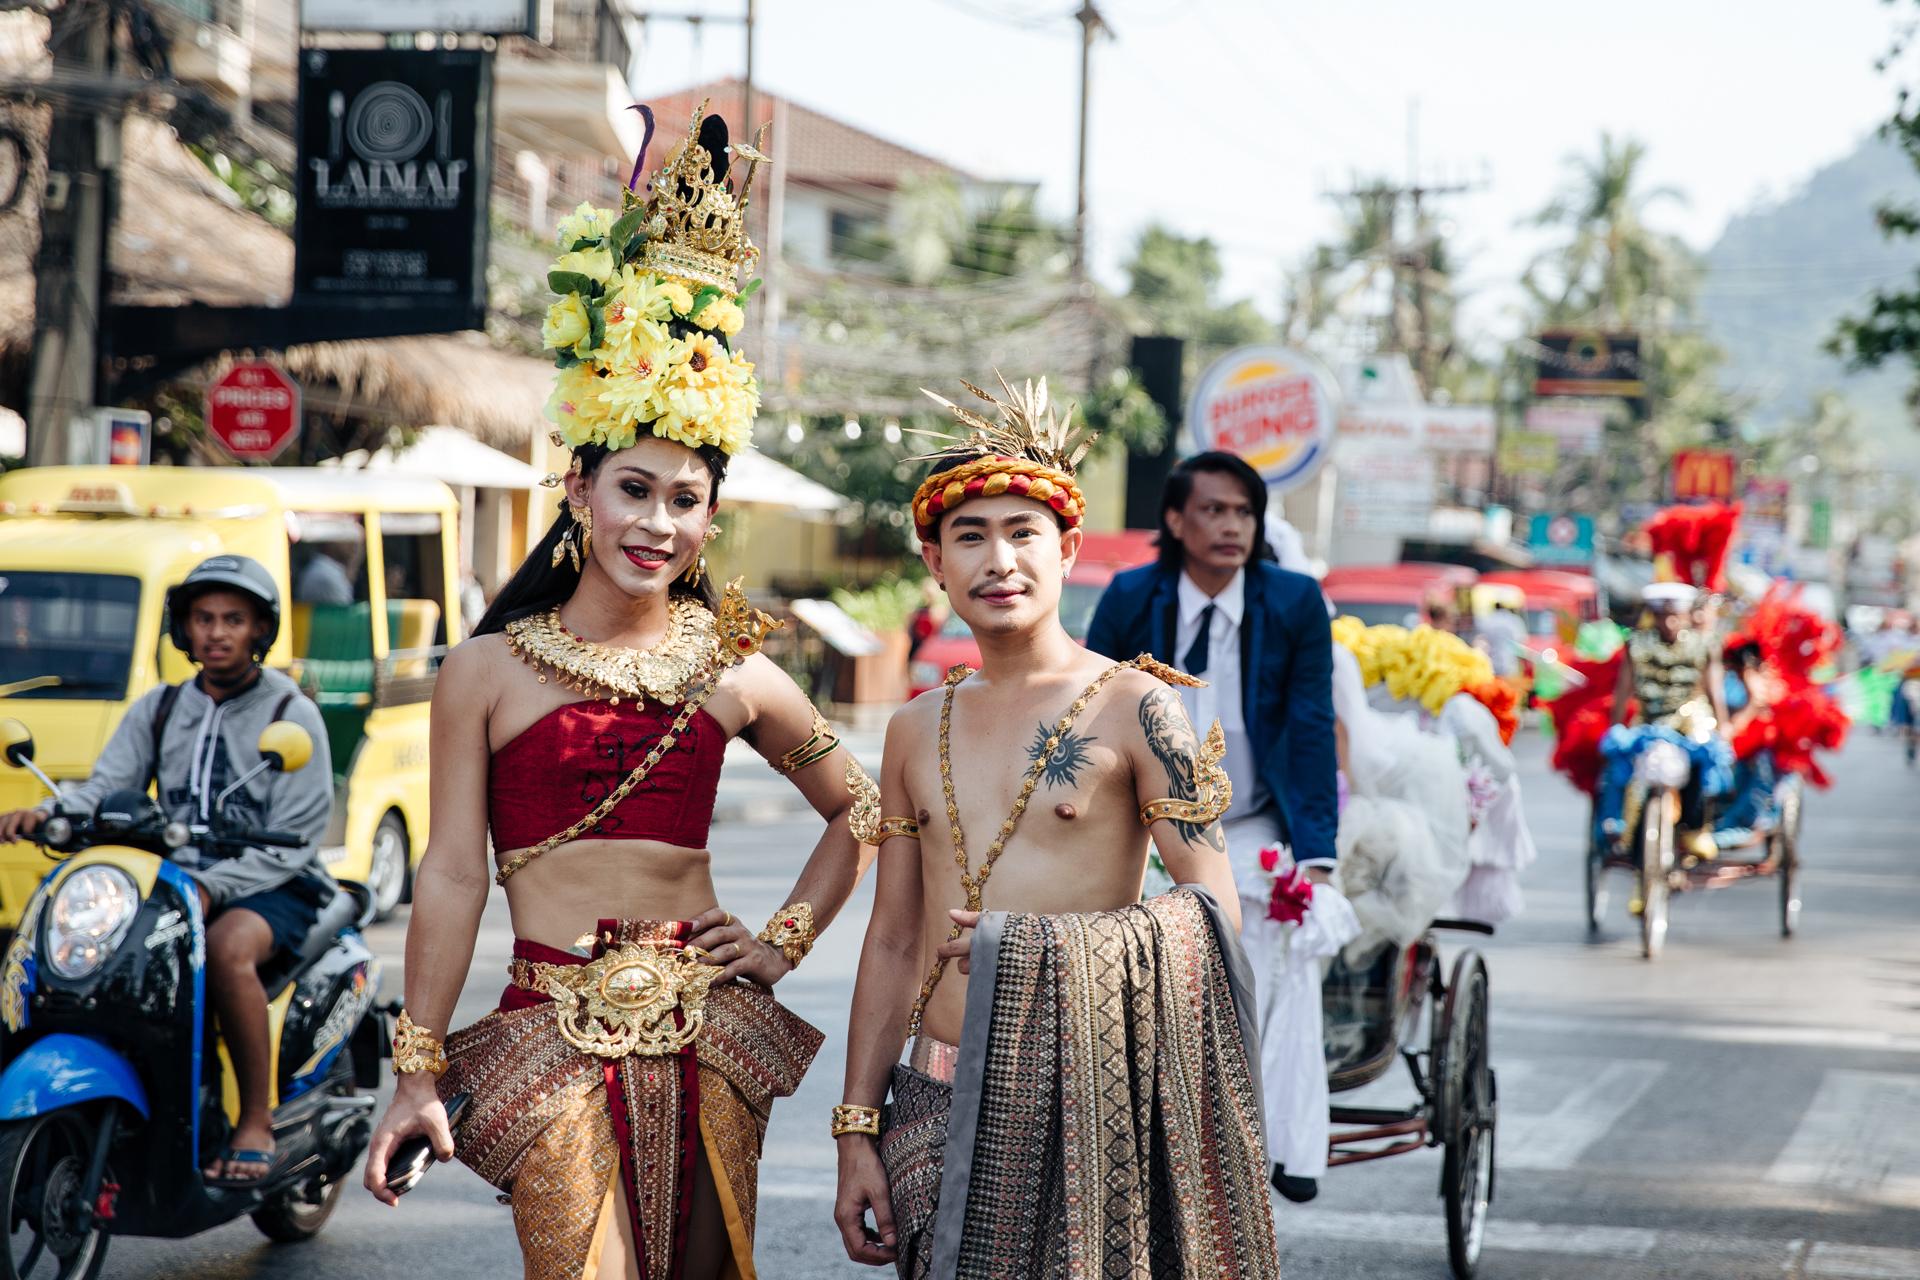 Phuket Pride 2016, Thailand (2016)